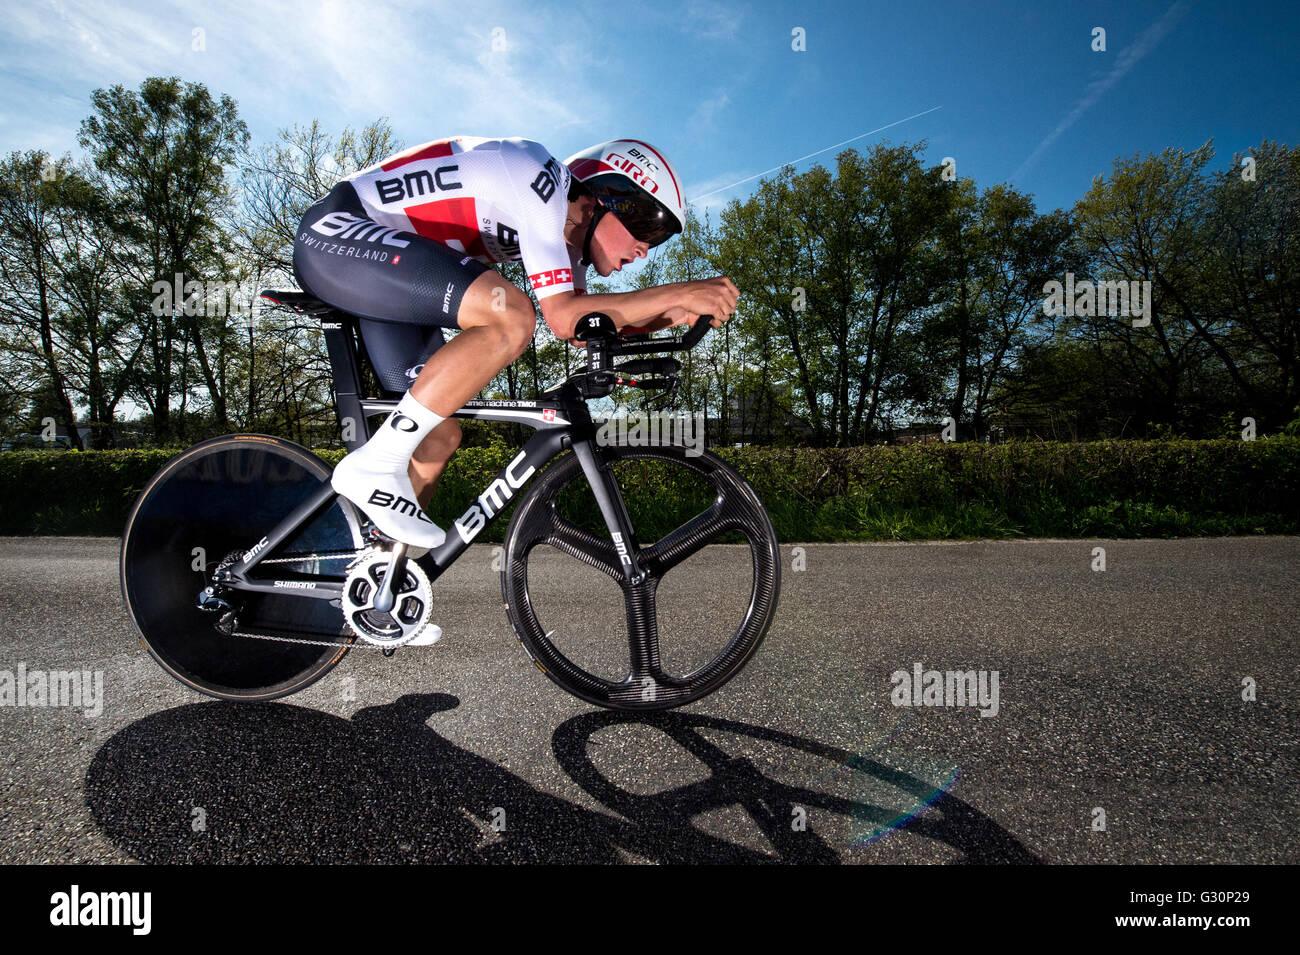 2016 Giro d'Italia. L'étape 1. Contre-la-montre individuel, Apeldoorn. Silvan Dillier (BMC) Photo Stock